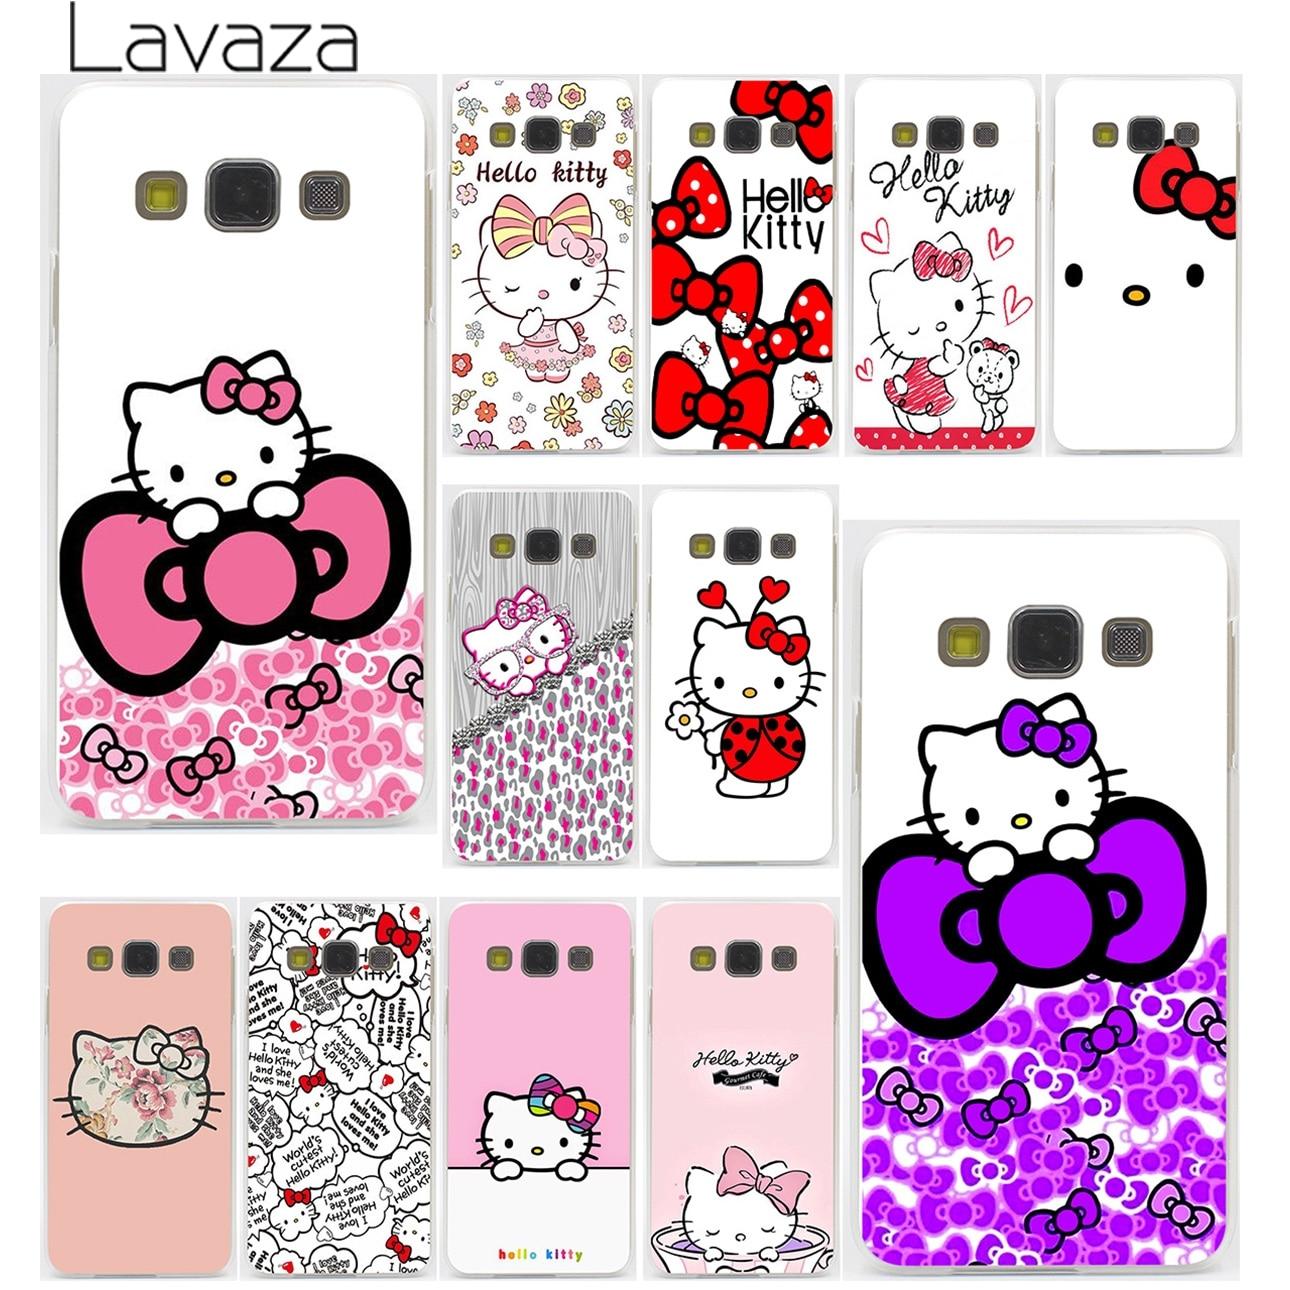 Fashionable Hello Kitty Hard Case for Galaxy S3 S4 S5 & Mini S6 S7 Edge S6 S8 Edge Plus